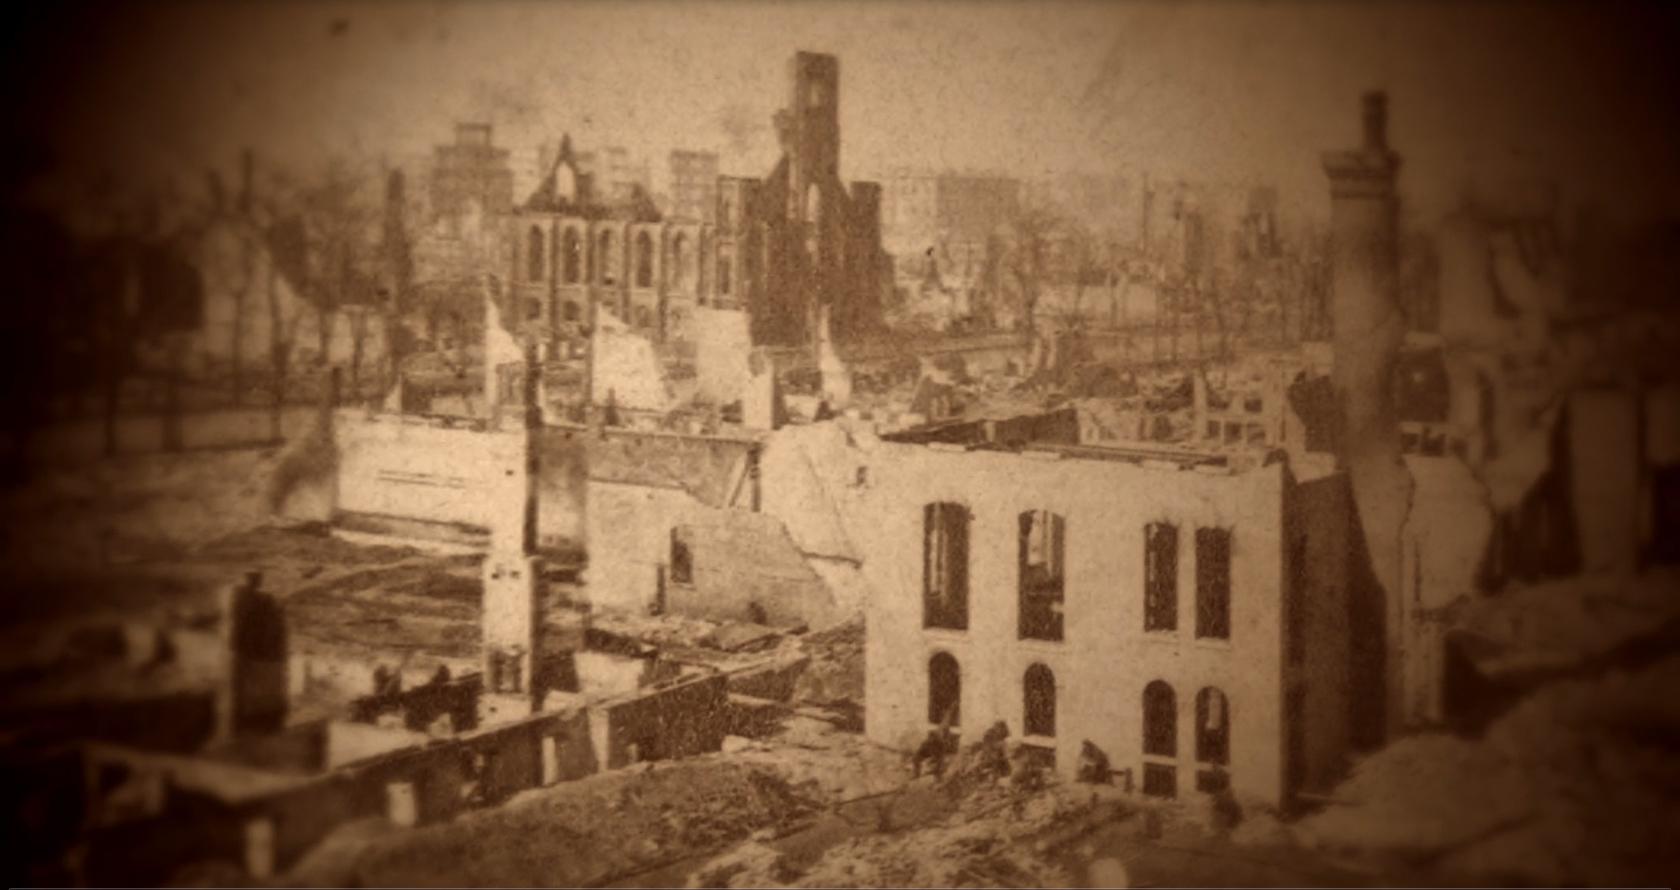 chicago fire aftermath.jpg